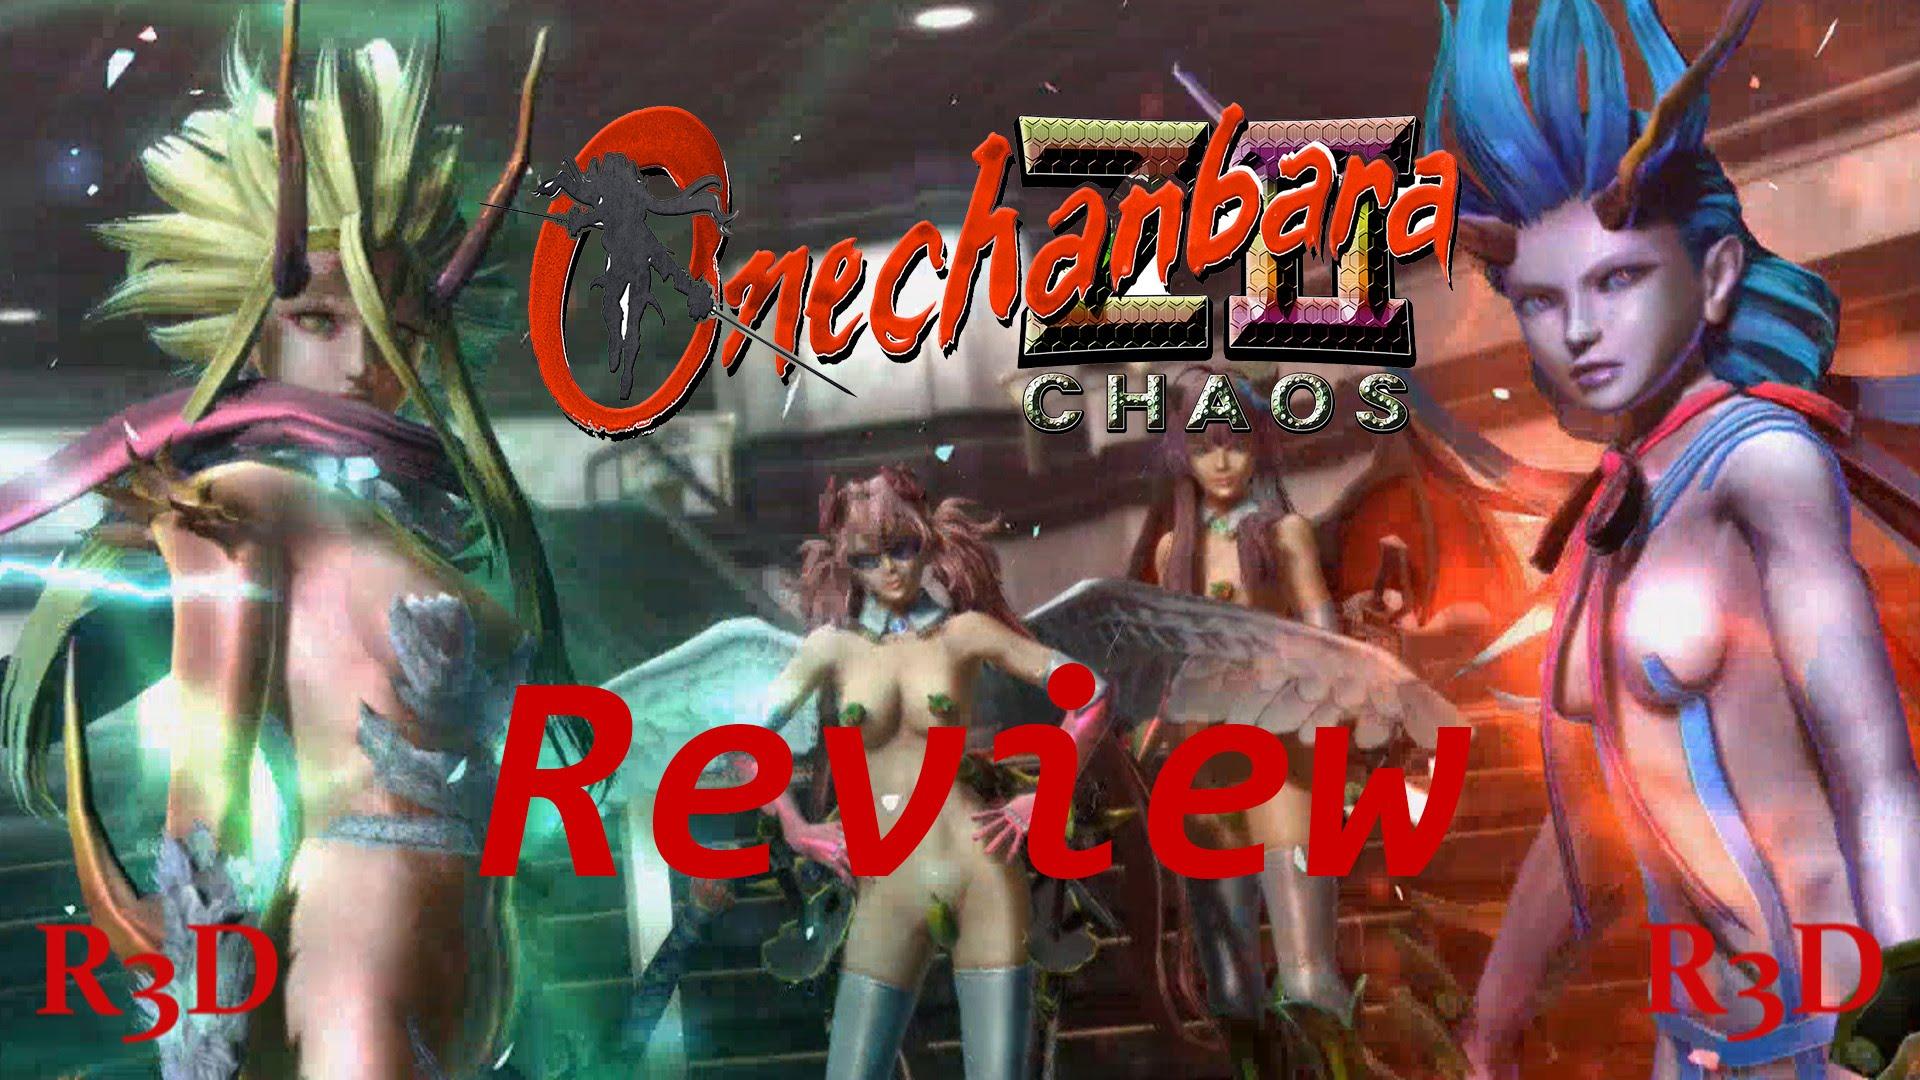 Onechanbara Z2 Chaos R3DPlaystation Review   Banana Split Edition 1920x1080